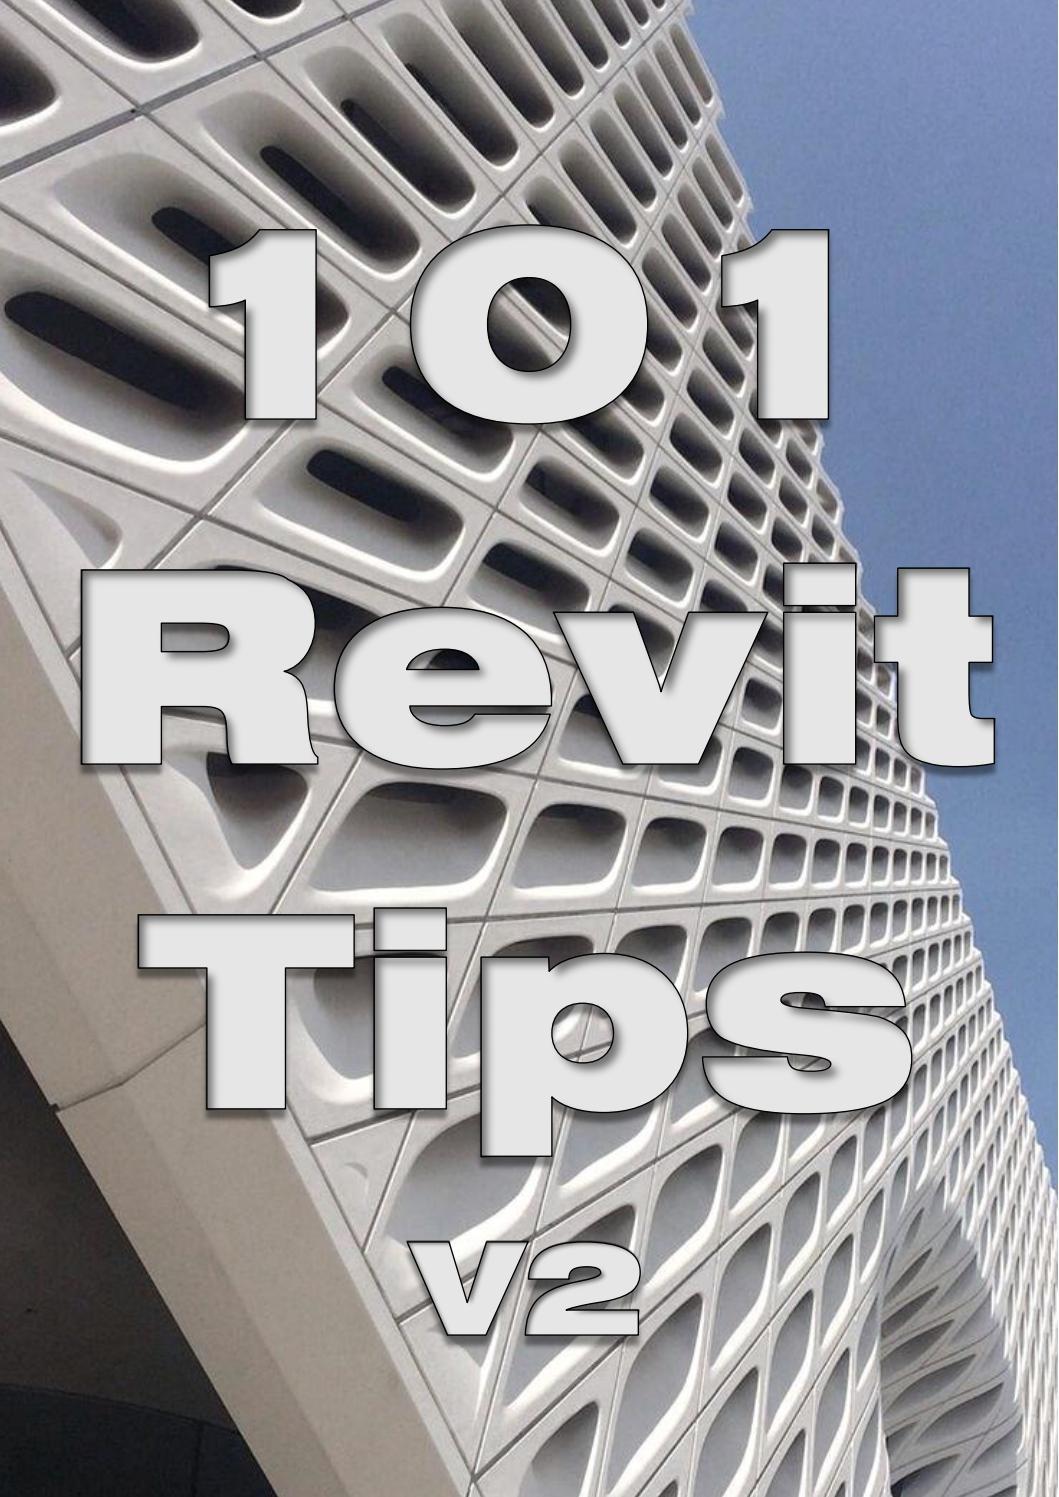 101 Best Practice Revit Tips V2 by Iftikhar Ismail